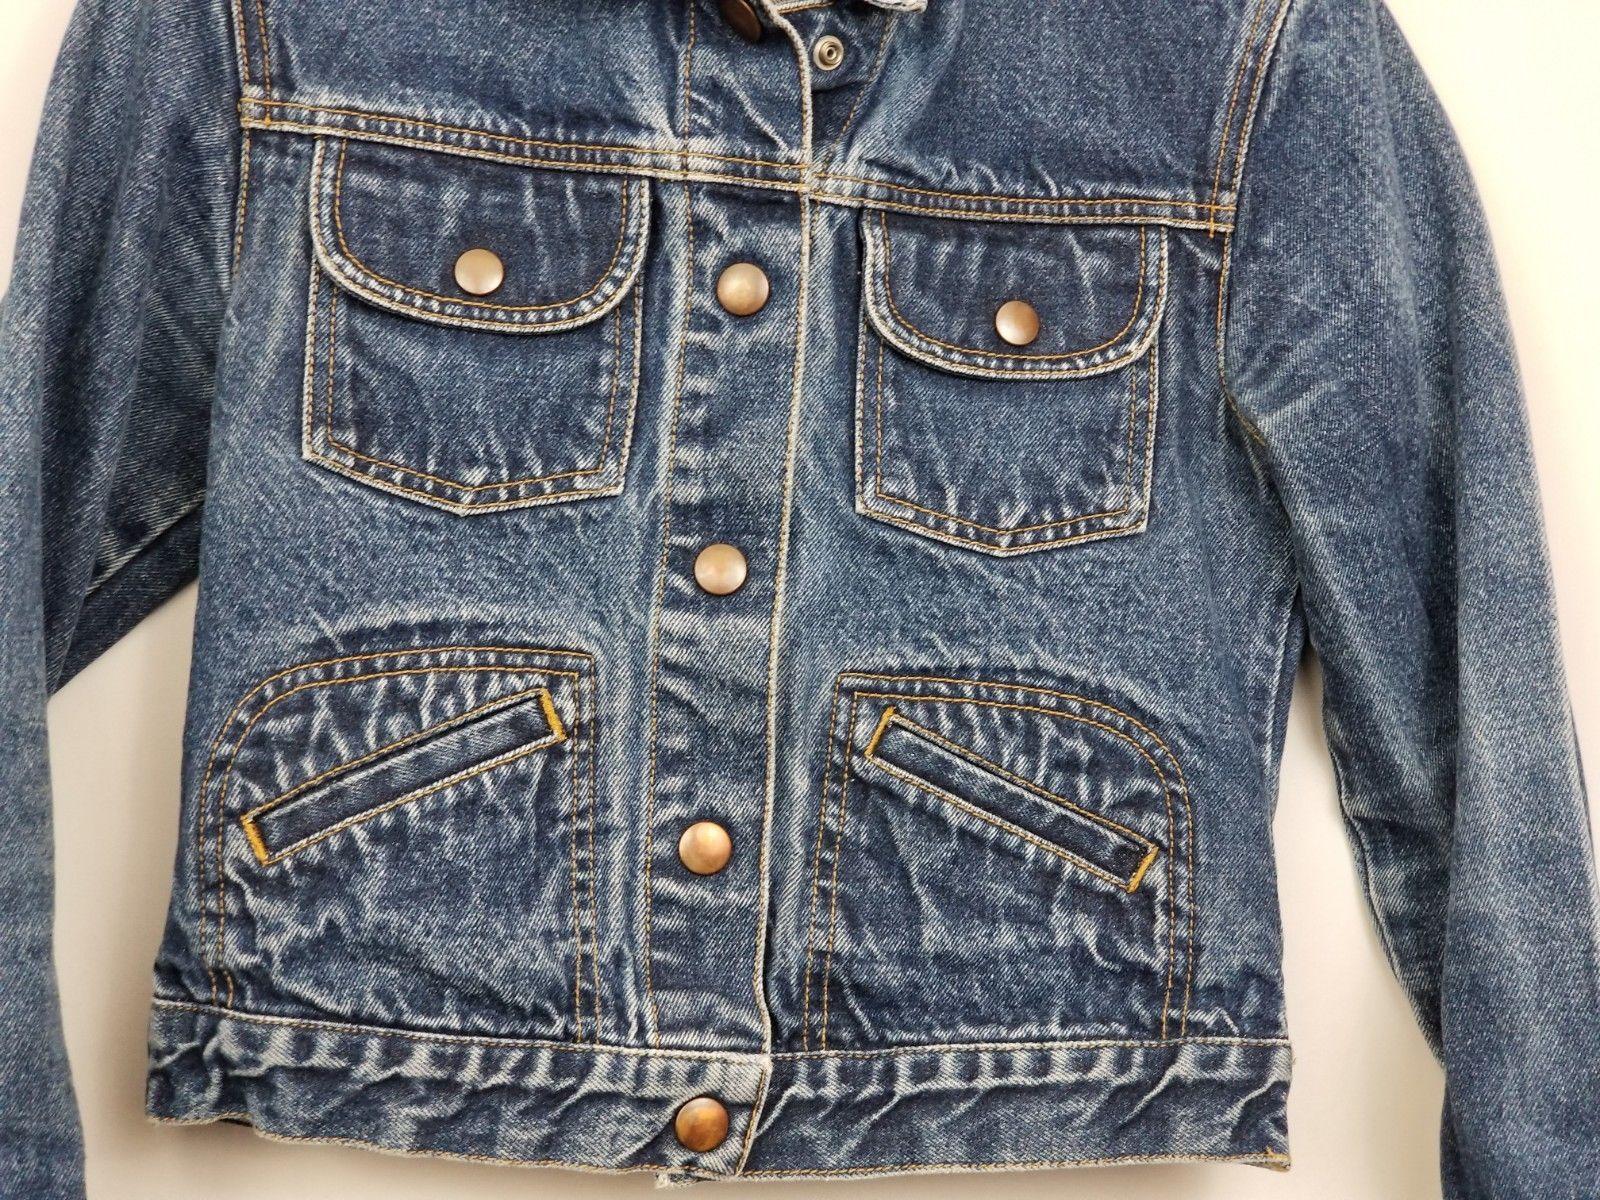 GAP Kids Denim Jean Jacket Coat Long Sleeve Blue Pockets Large Factory Store image 3